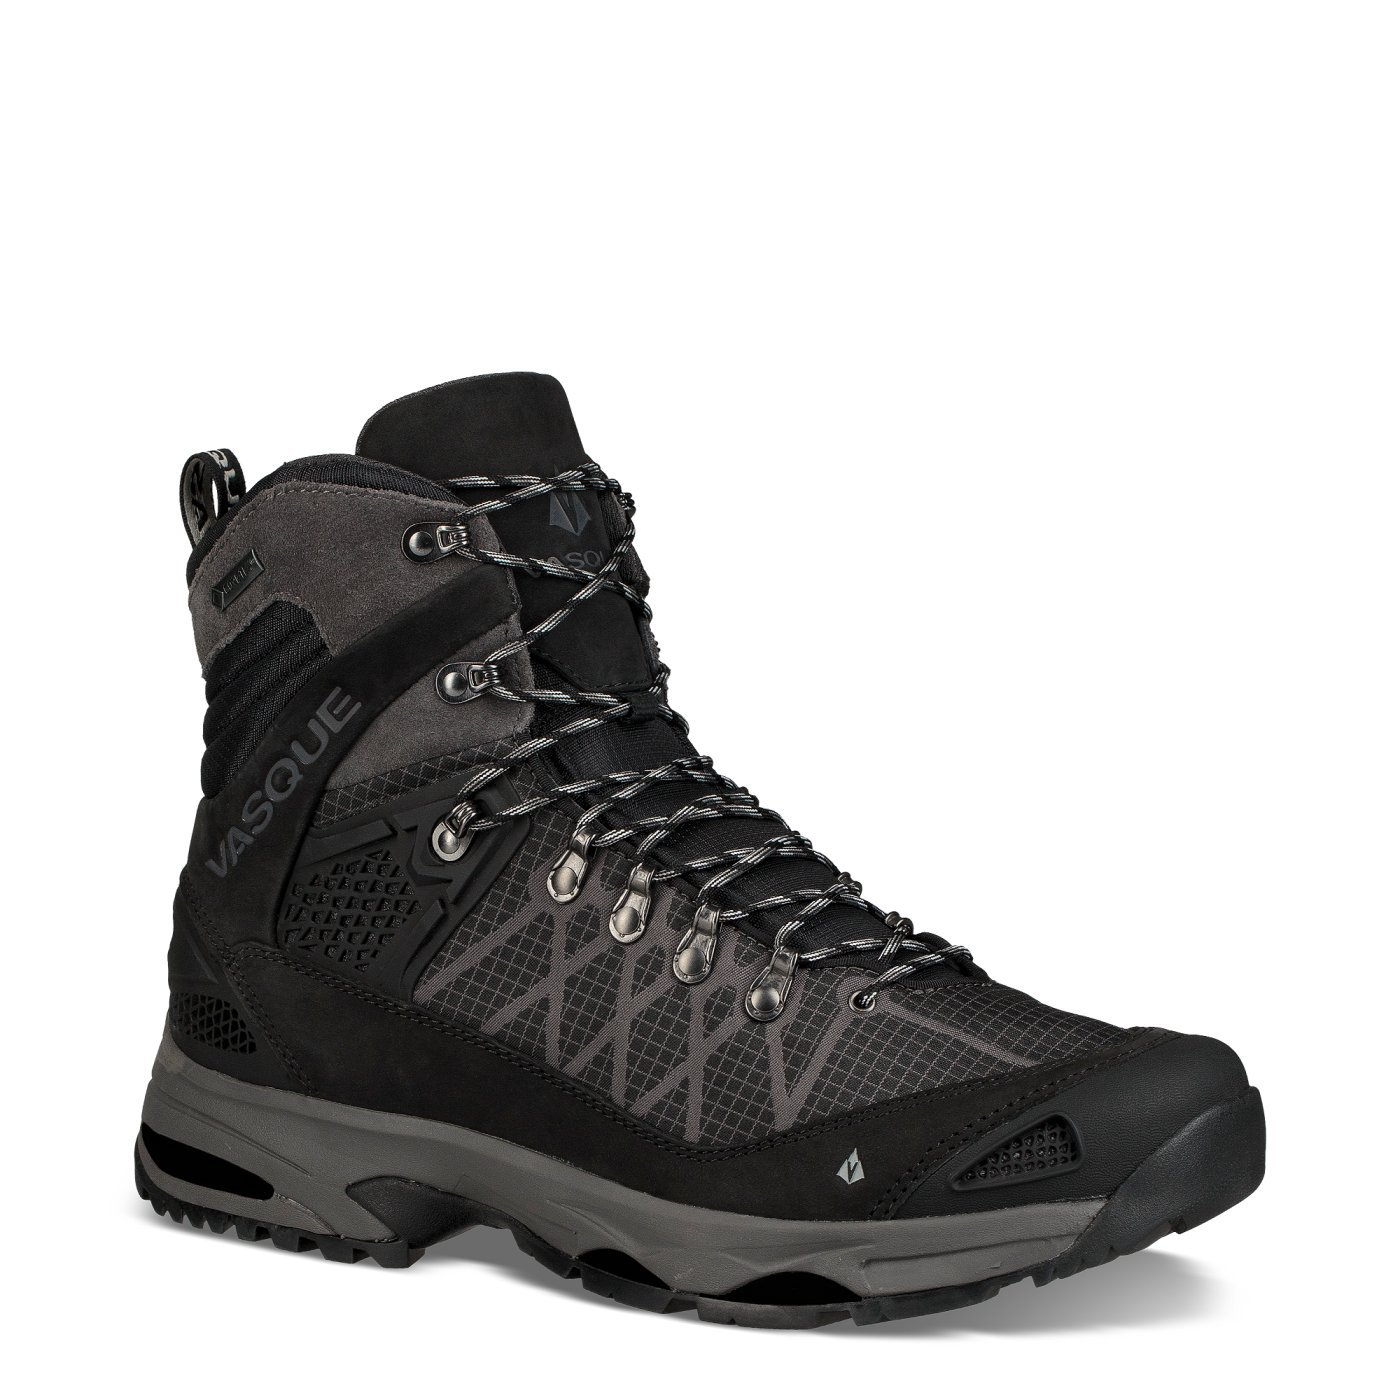 Vasque Mens Saga Gtx Waterproof Mid Backpacking Boots